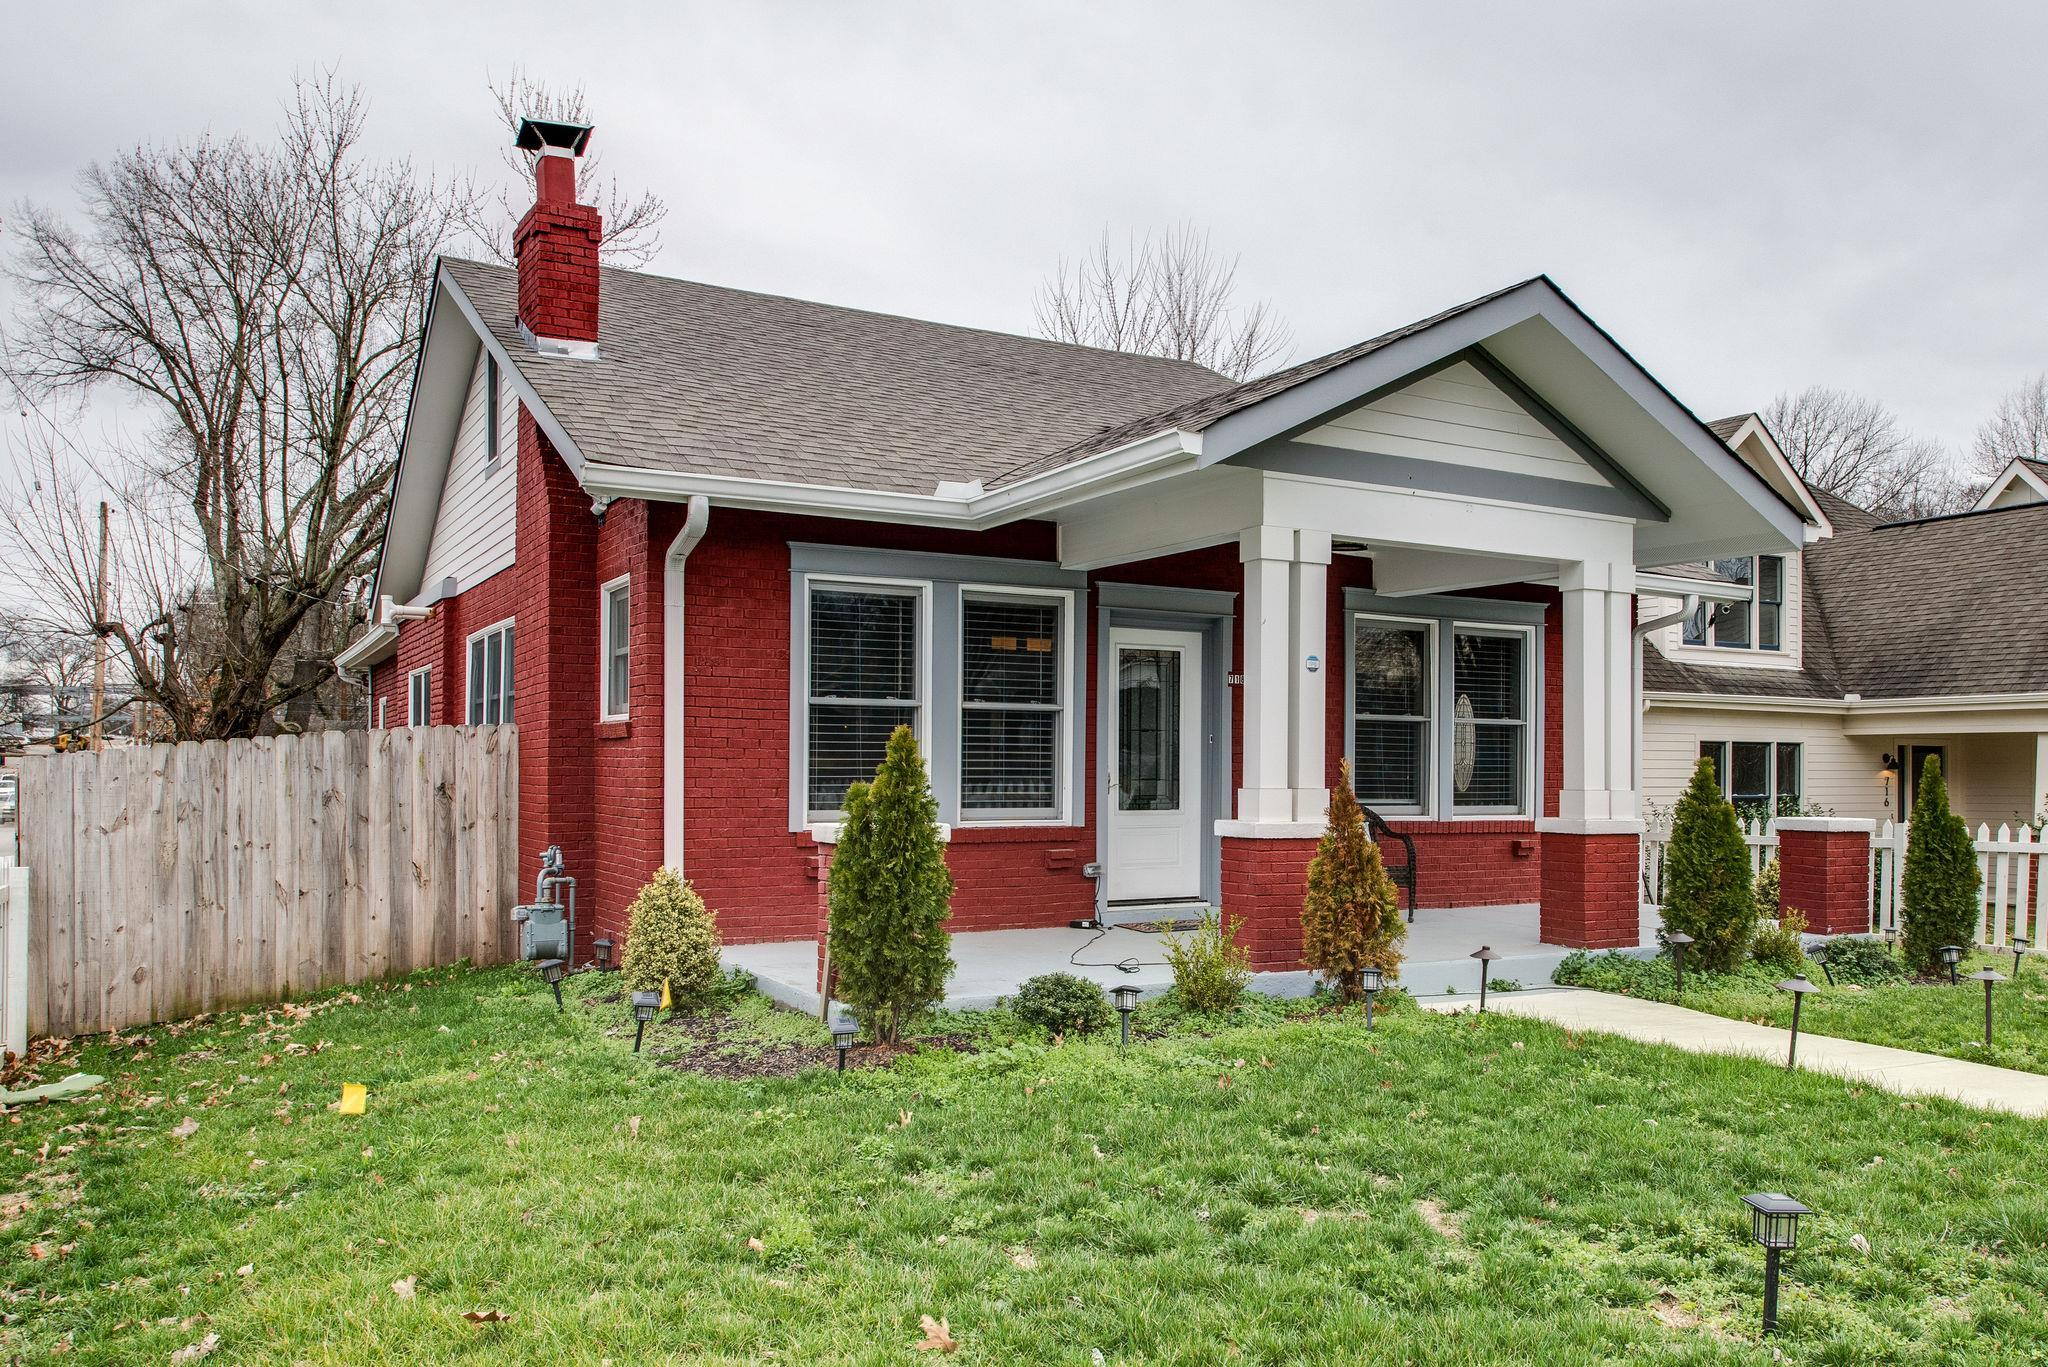 718 Shelby Ave, Nashville, TN 37206 - Nashville, TN real estate listing